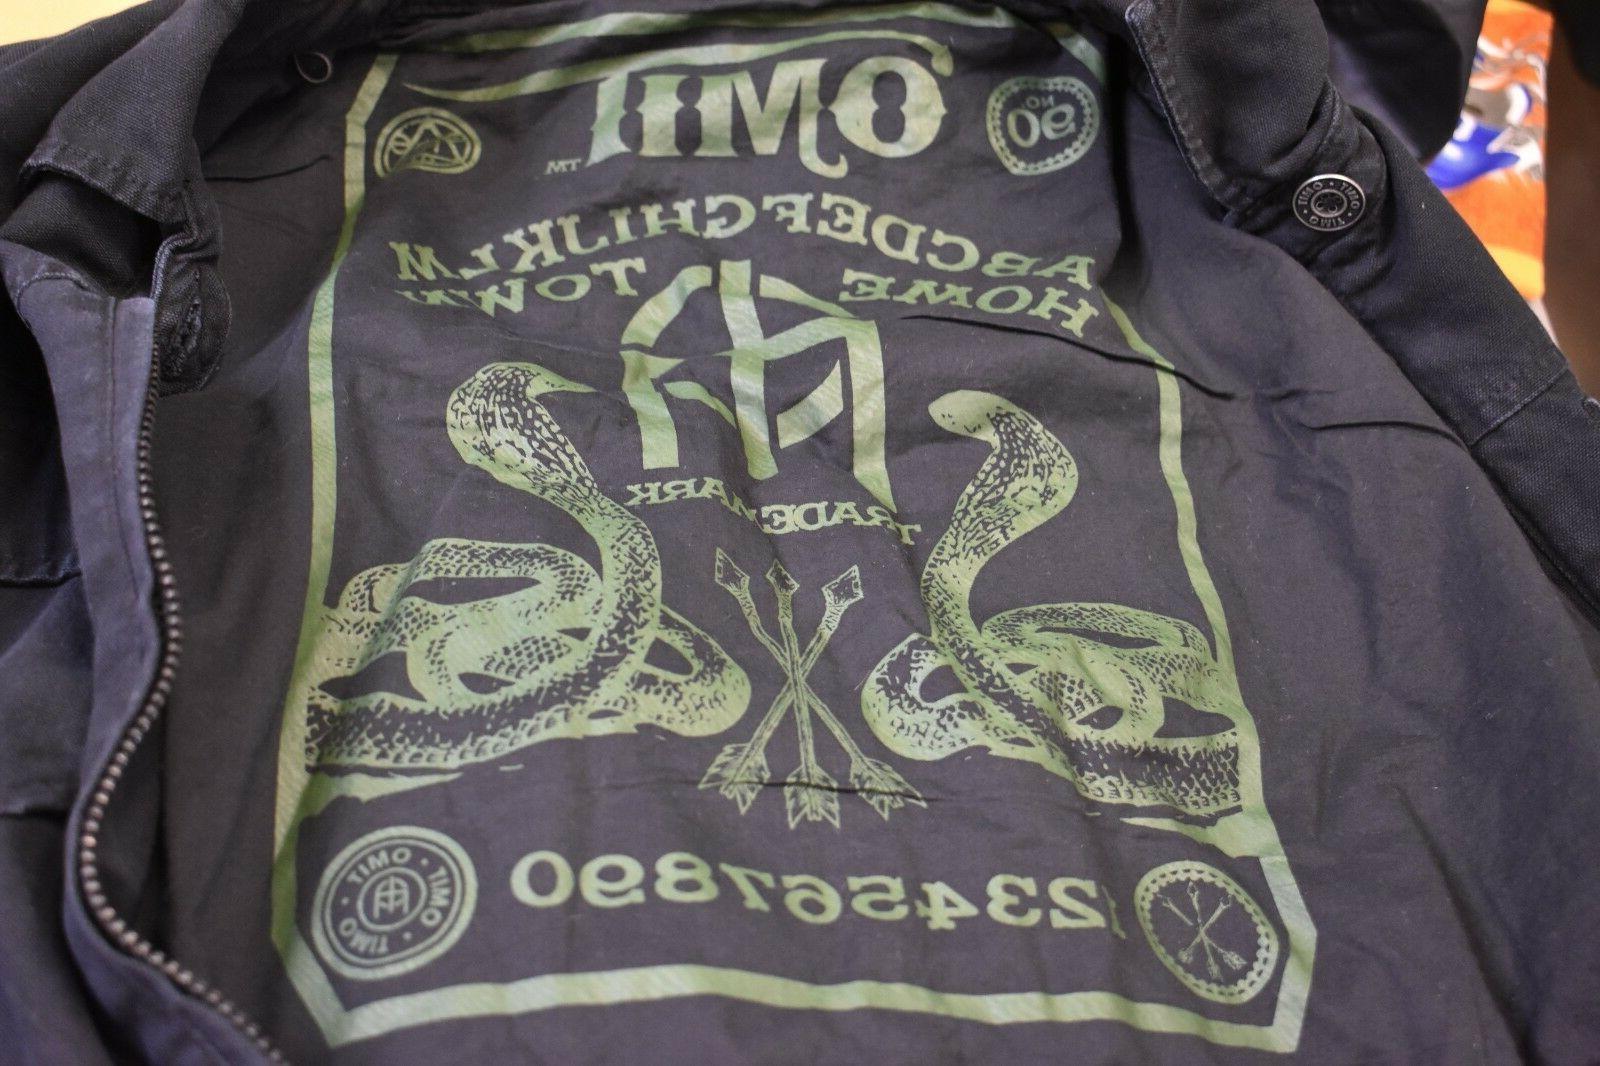 OMIT Brand Up